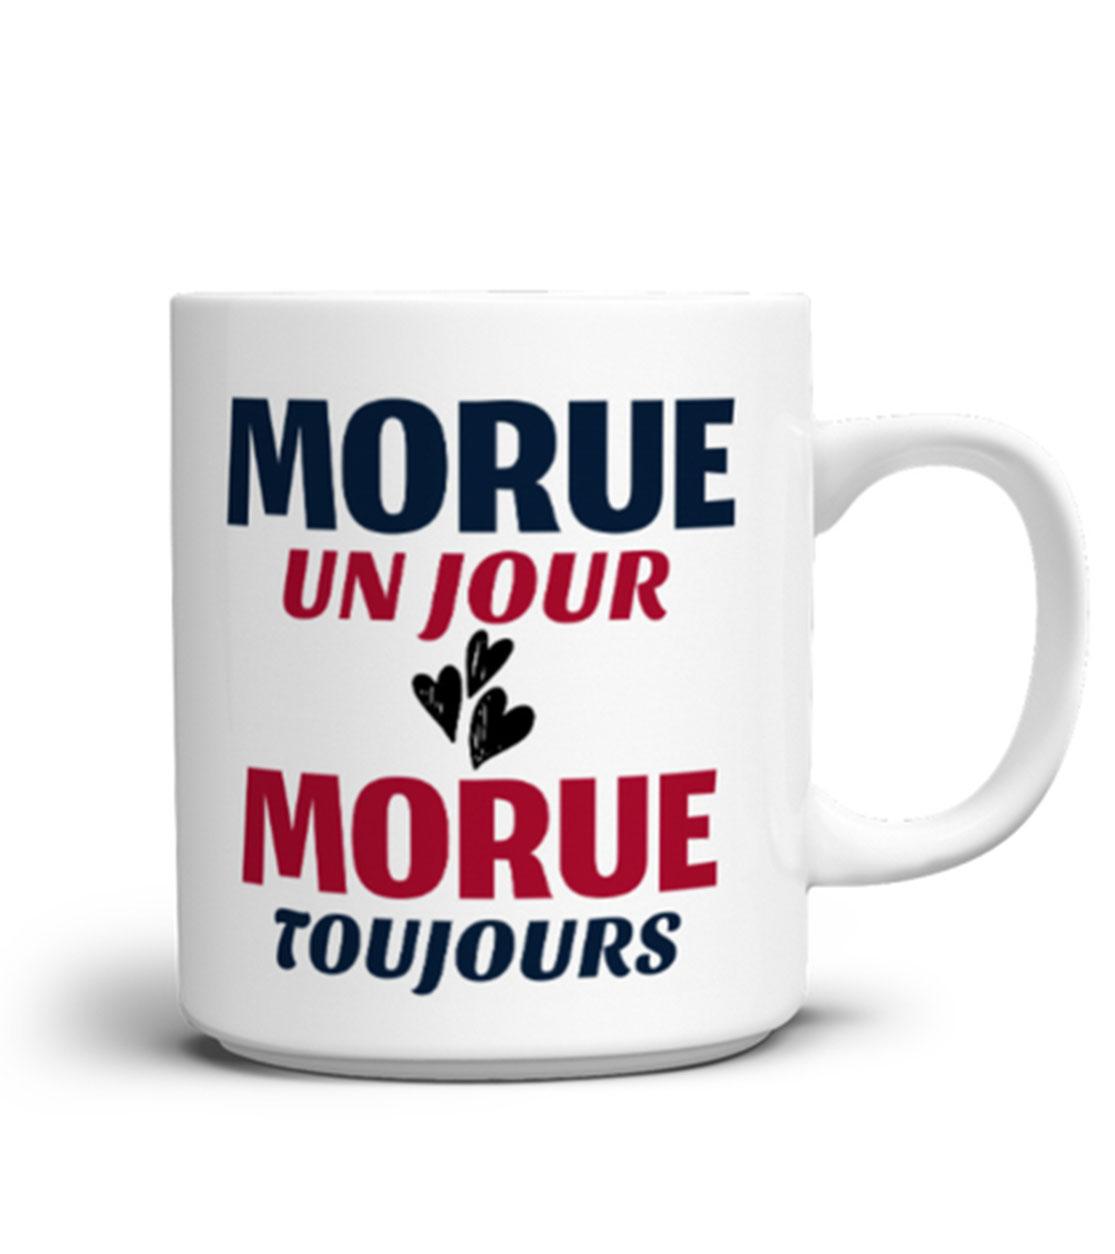 Morue-un-jour-morue-toujours-tasse-mug3 -1